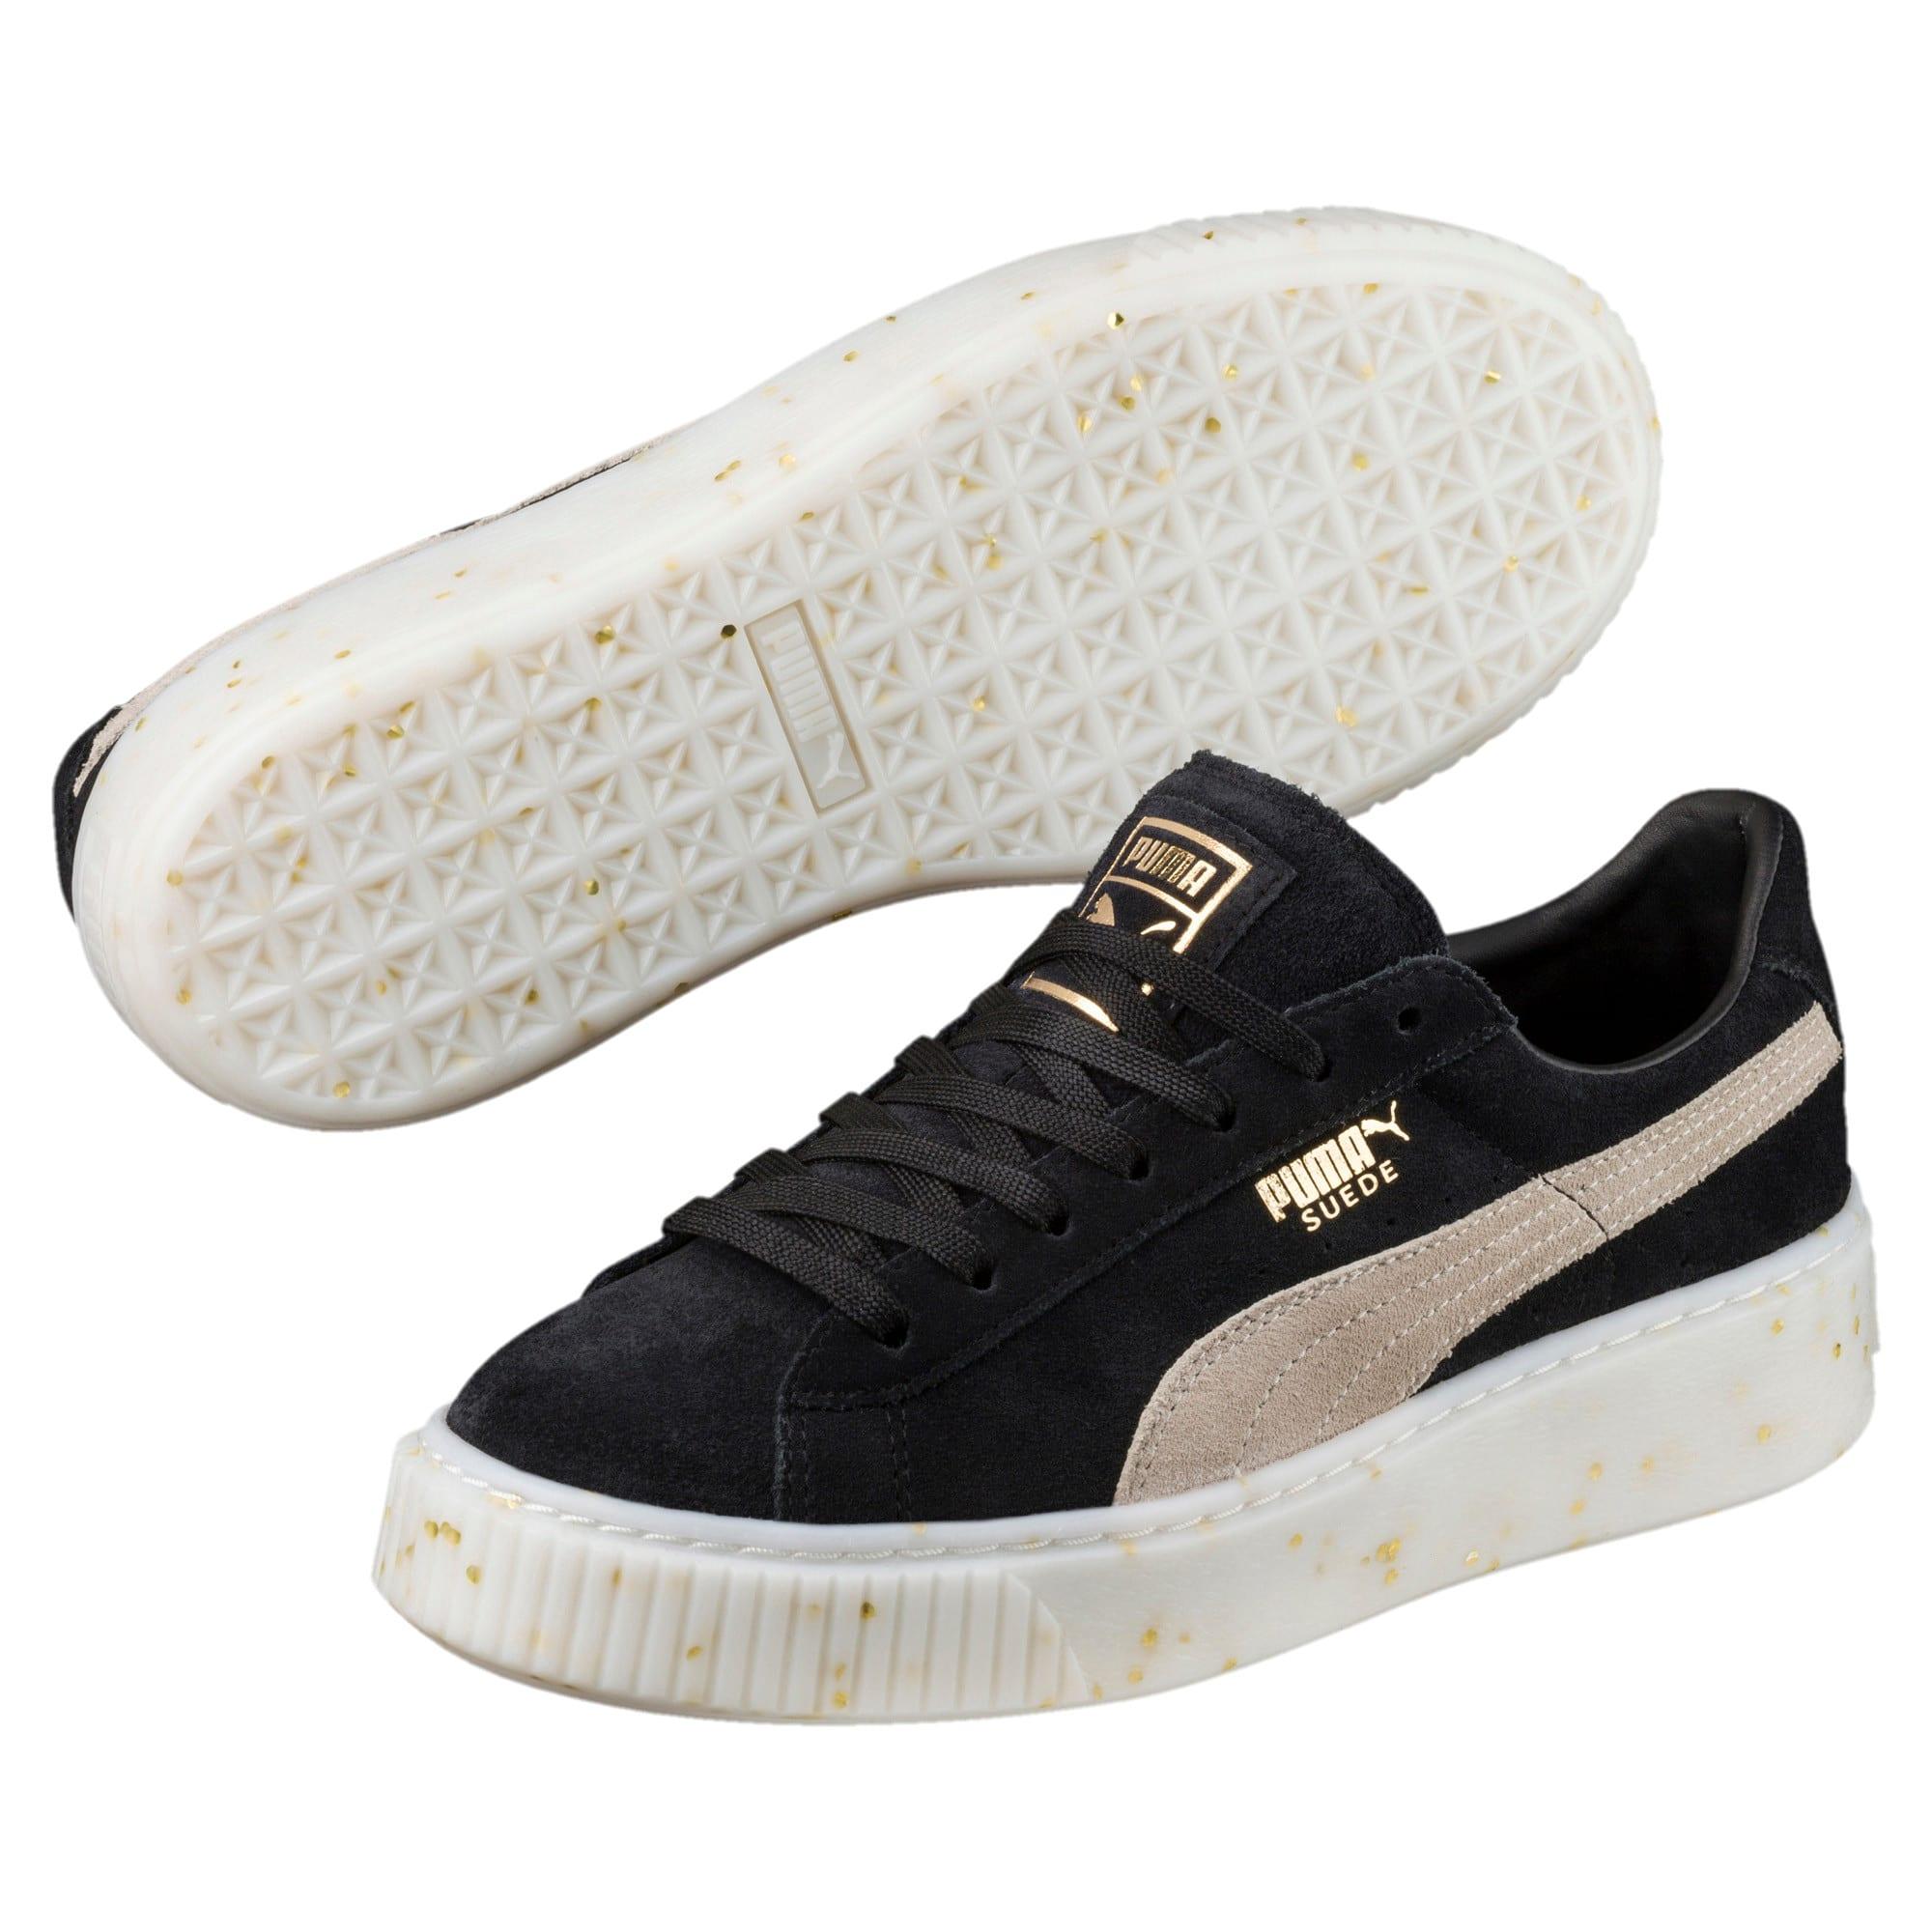 Thumbnail 2 of Suede Platform Celebrate Women's Sneakers, Puma Black-Puma White-Gold, medium